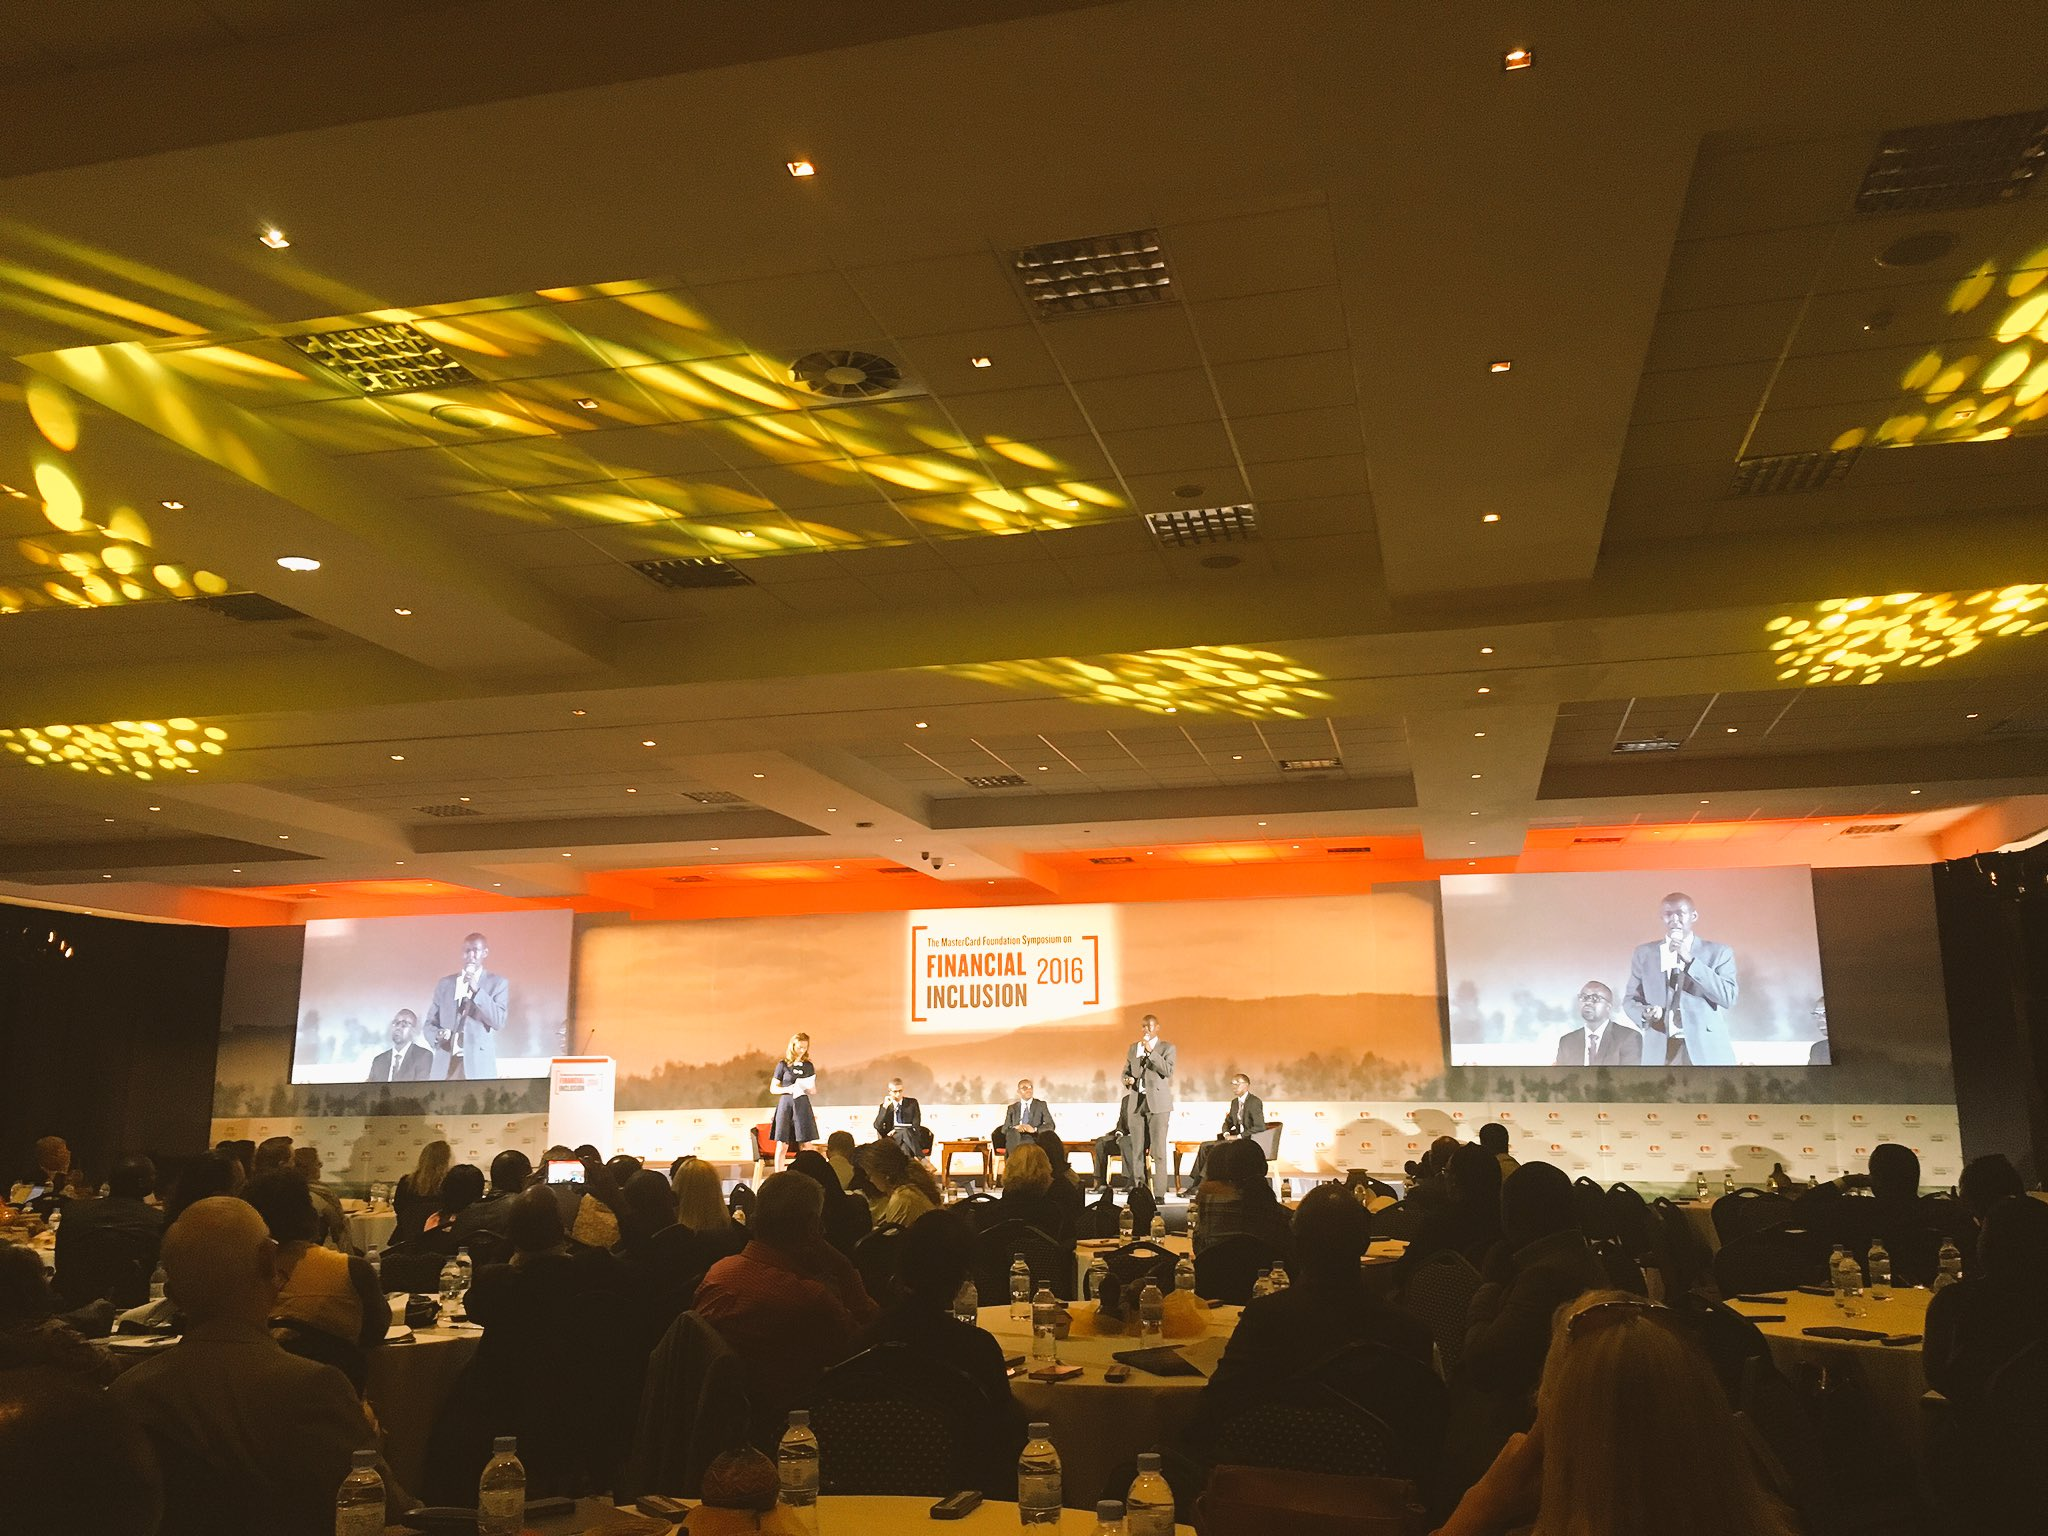 .@ivanmurenzi telling the @AfrRwanda story @MastercardFdn #sofi2016 @DFID_PSD @USAIDAfrica #saccos #finscope #DFS #informalpensions https://t.co/8NKKnfkesw